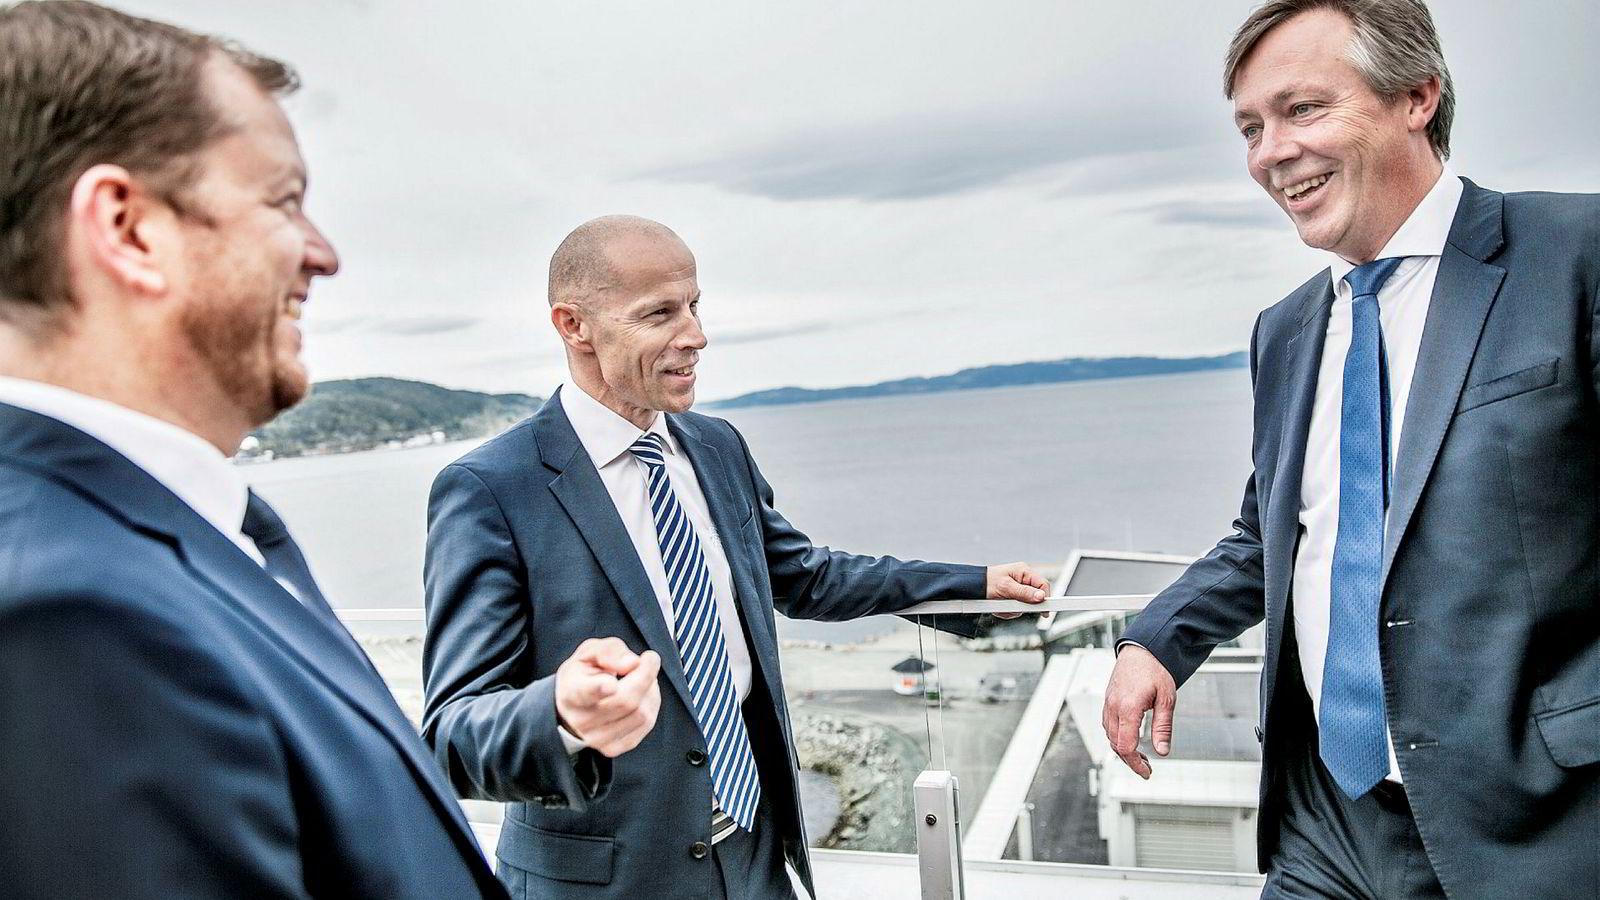 Administrerende direktør Charles Høstlund (midten), i Norway Royal Salmon, finansdirektør, Klaus Hatlebrekke (til venstre) og Anders Straumsheim (Fosen Yard) forteller hvem som skal bygge selskapets store nye havmerder.